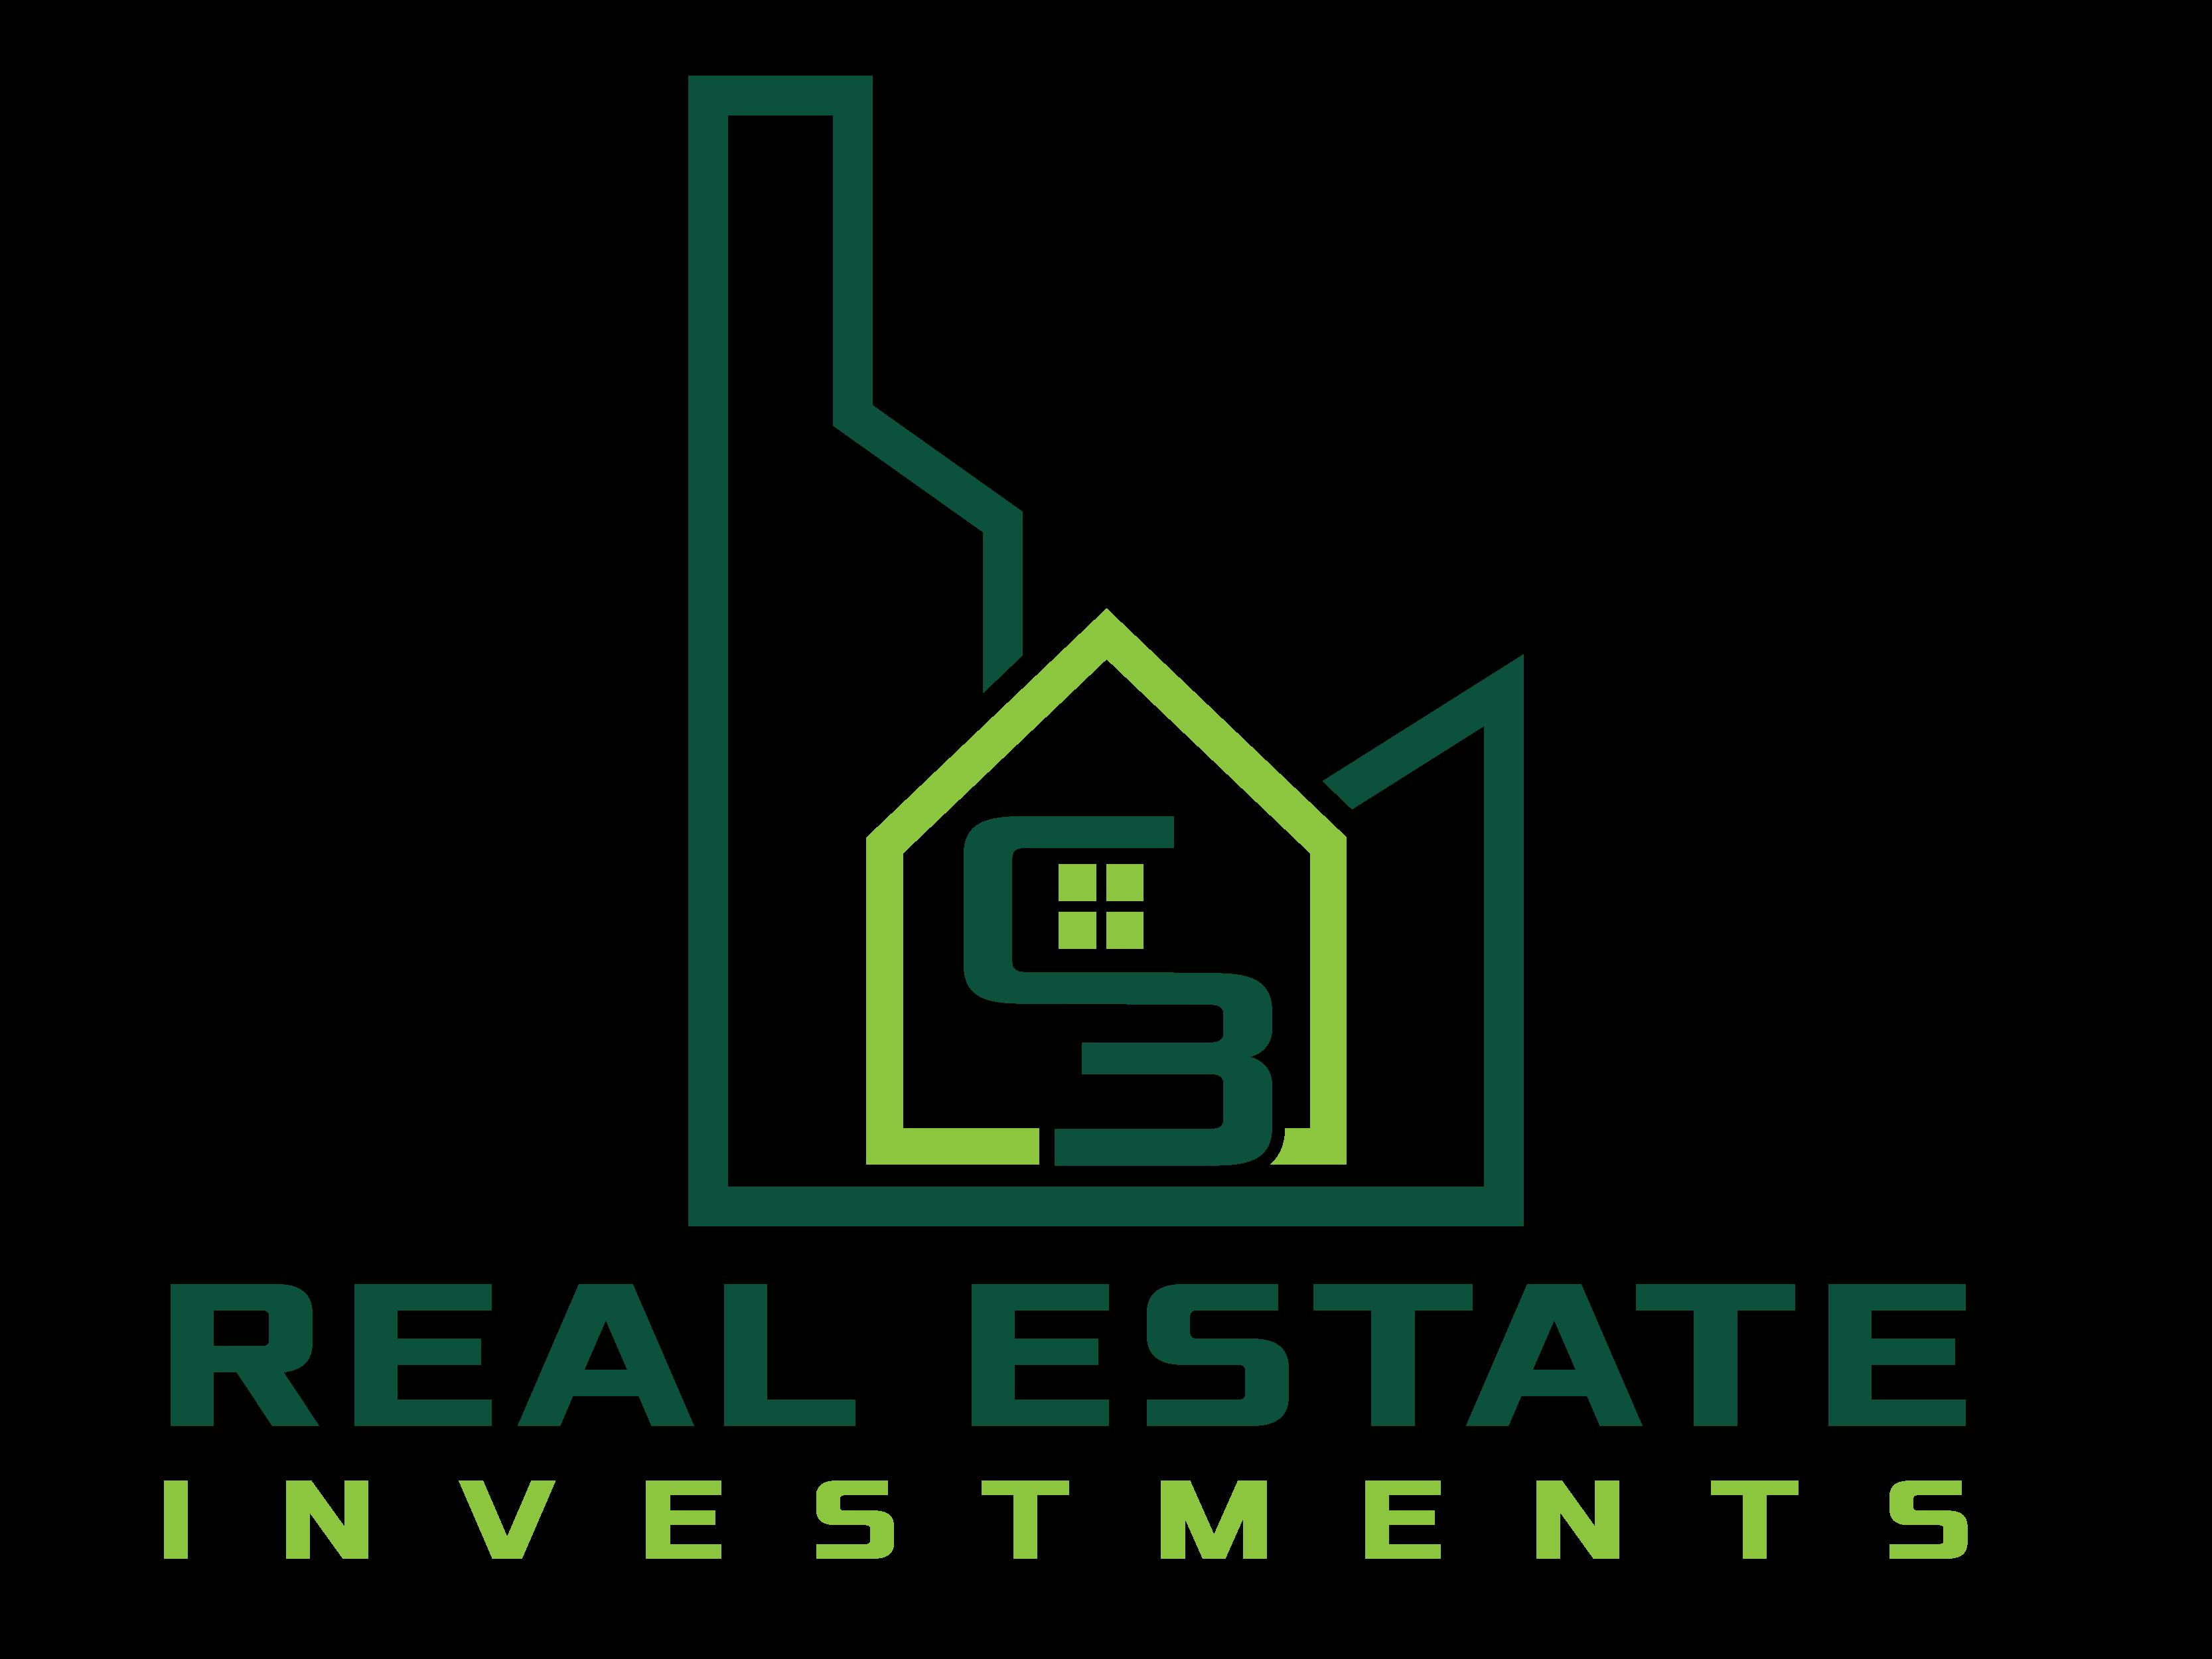 C3 Real Estate Investments, LLC